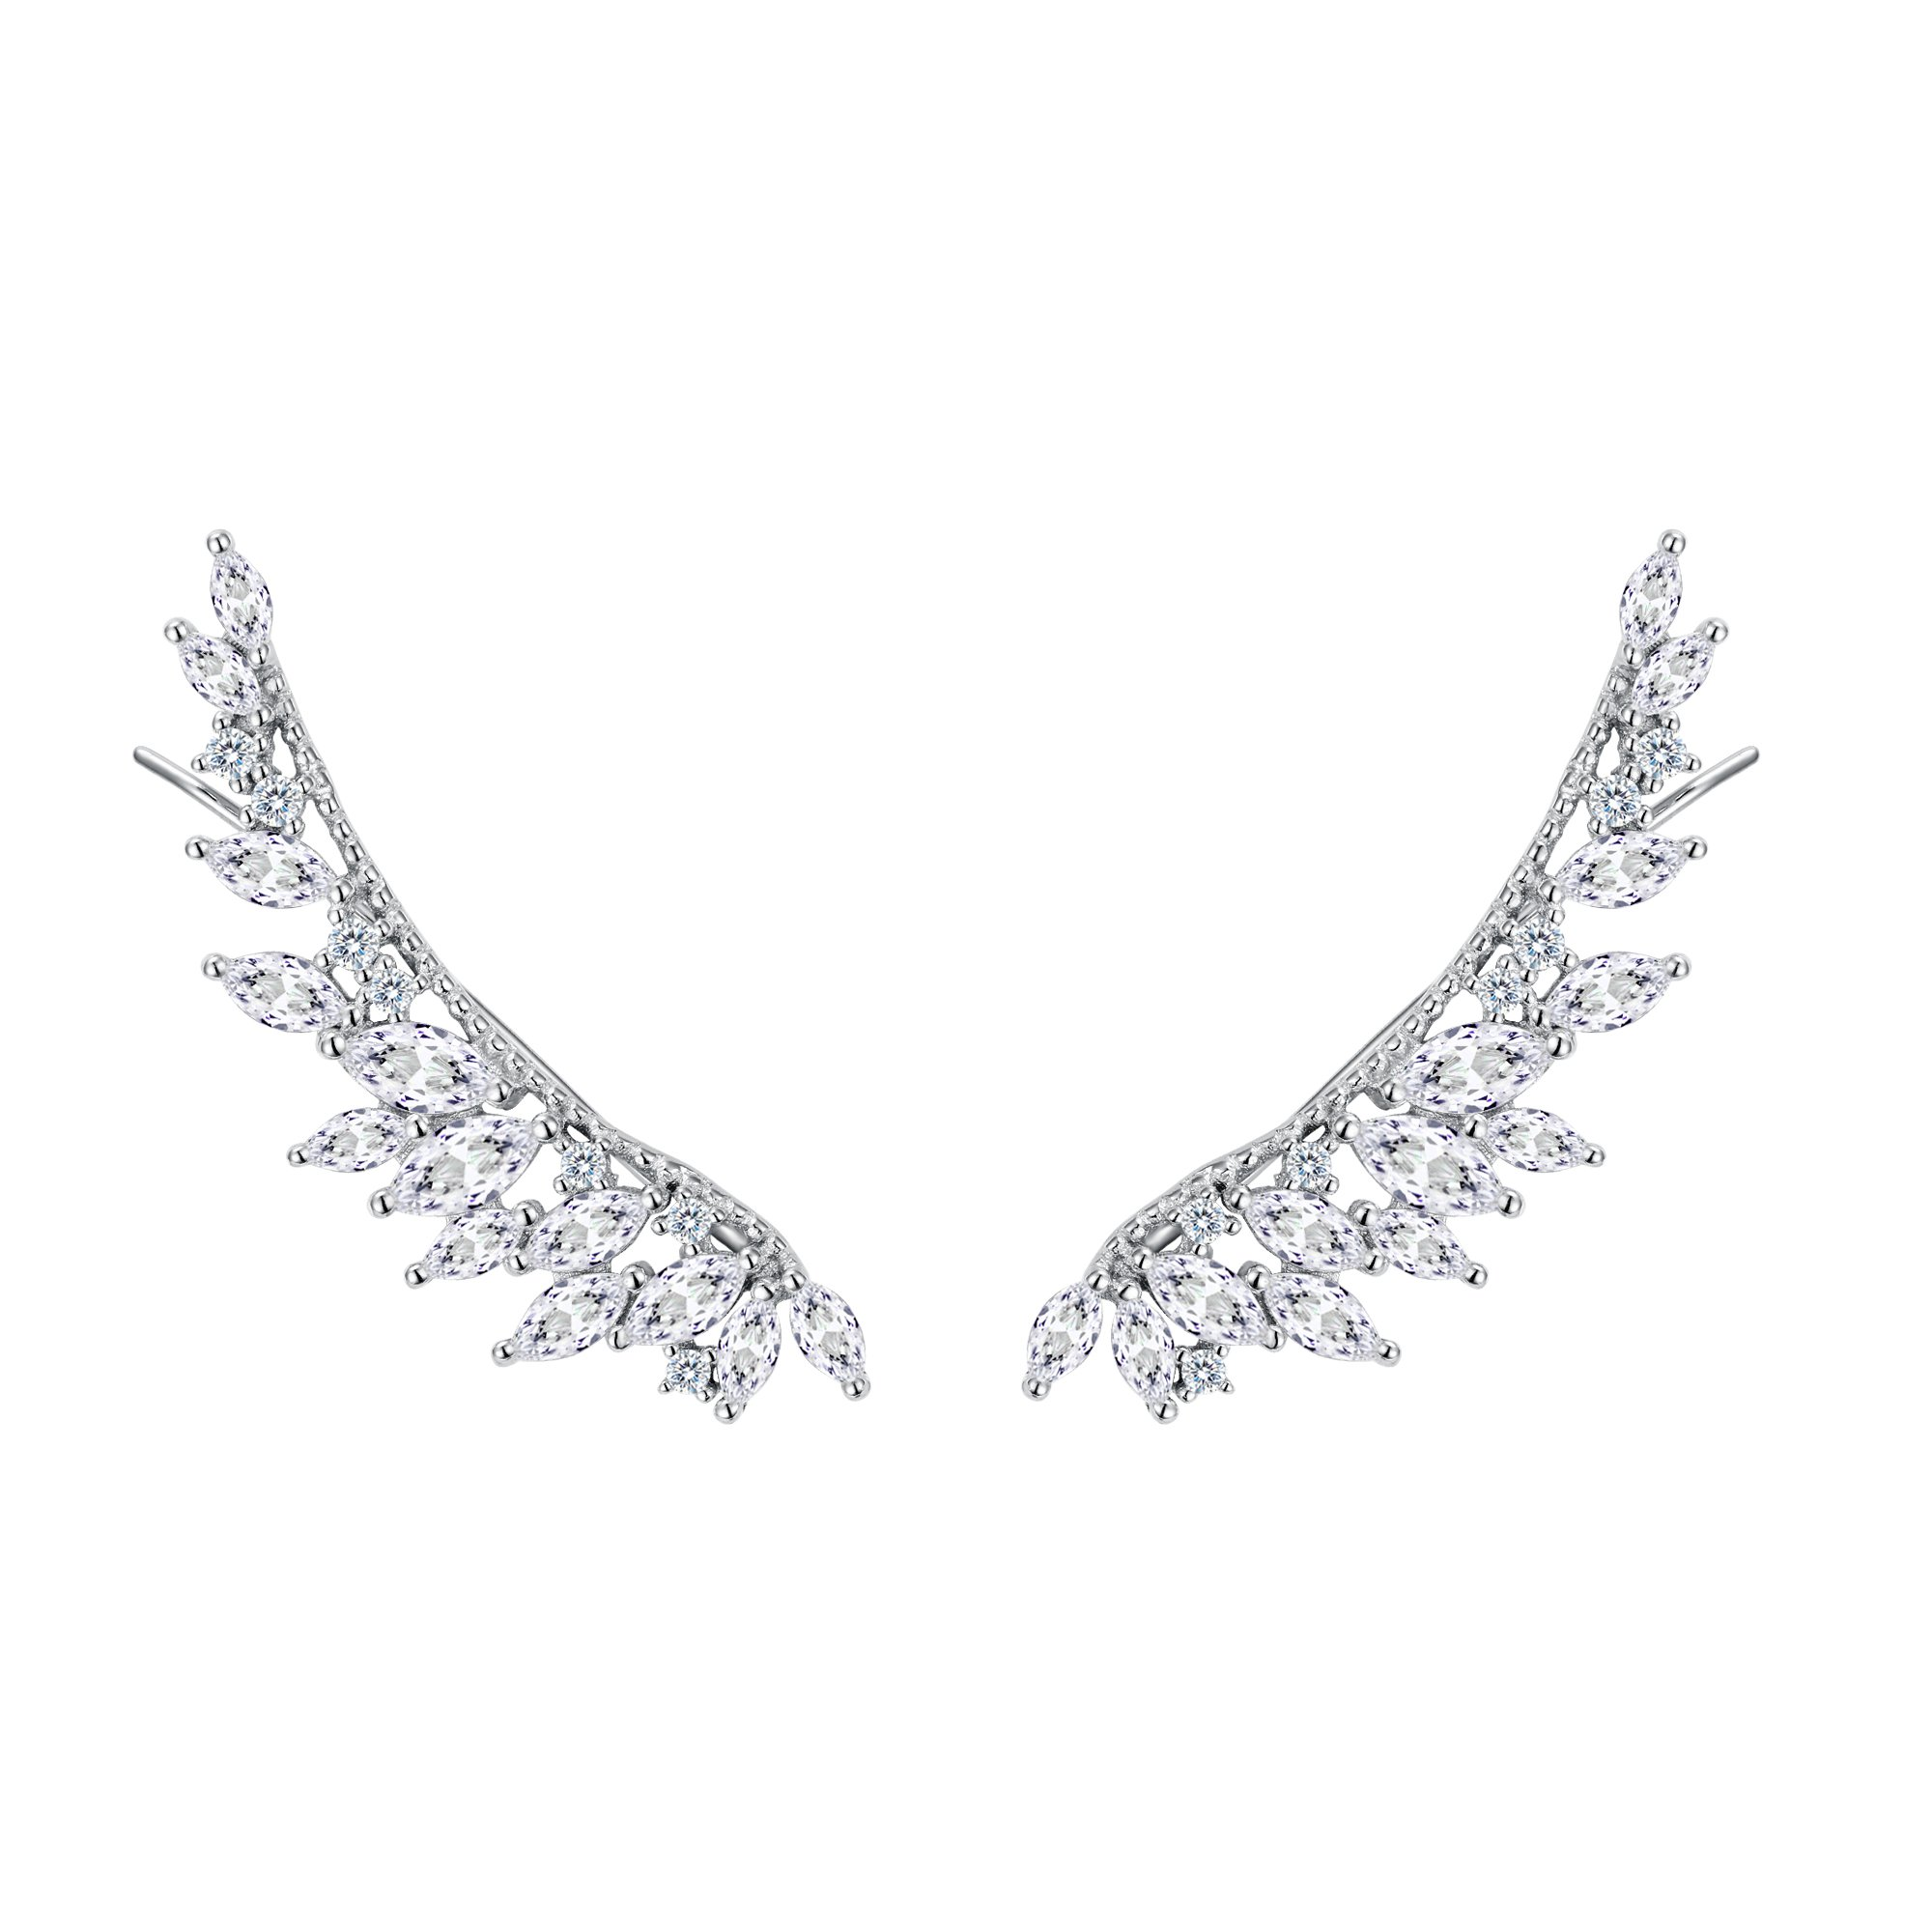 FANZE Women's 925 Sterling Silver CZ Irregular Wings of Angel Elegant Sweep Up Ear Pin Crawler Wrap Climber Earrings